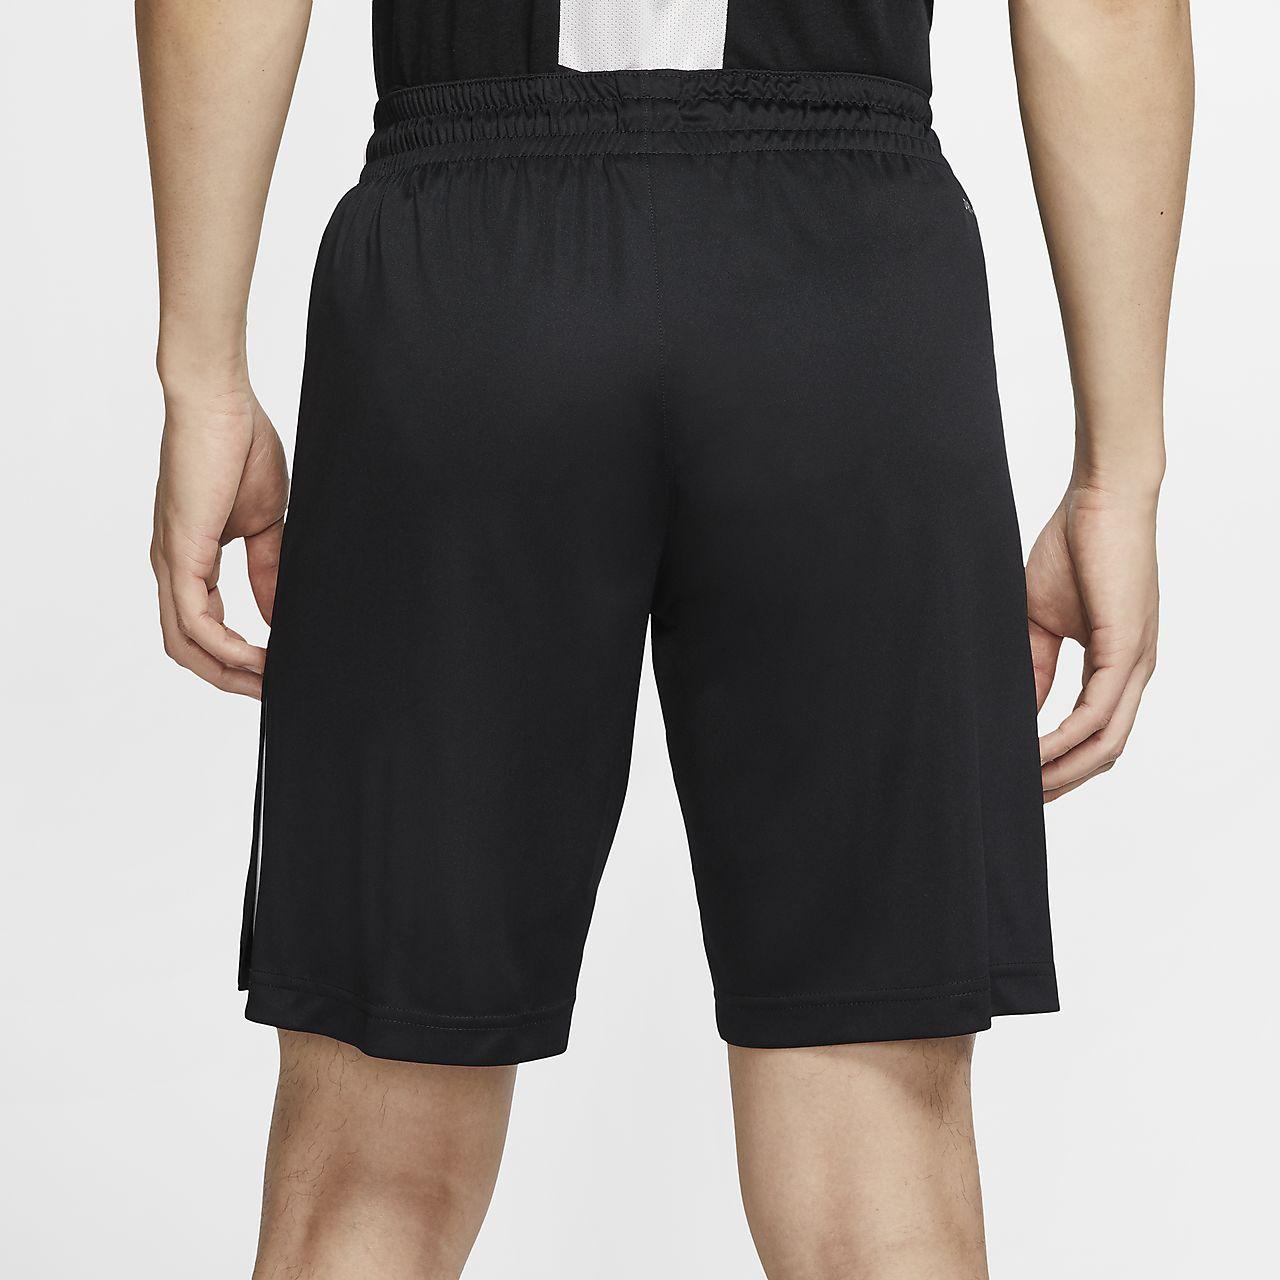 7dafc445 Мужские шорты для тренинга Jordan Dri-FIT 23 Alpha. Nike.com RU